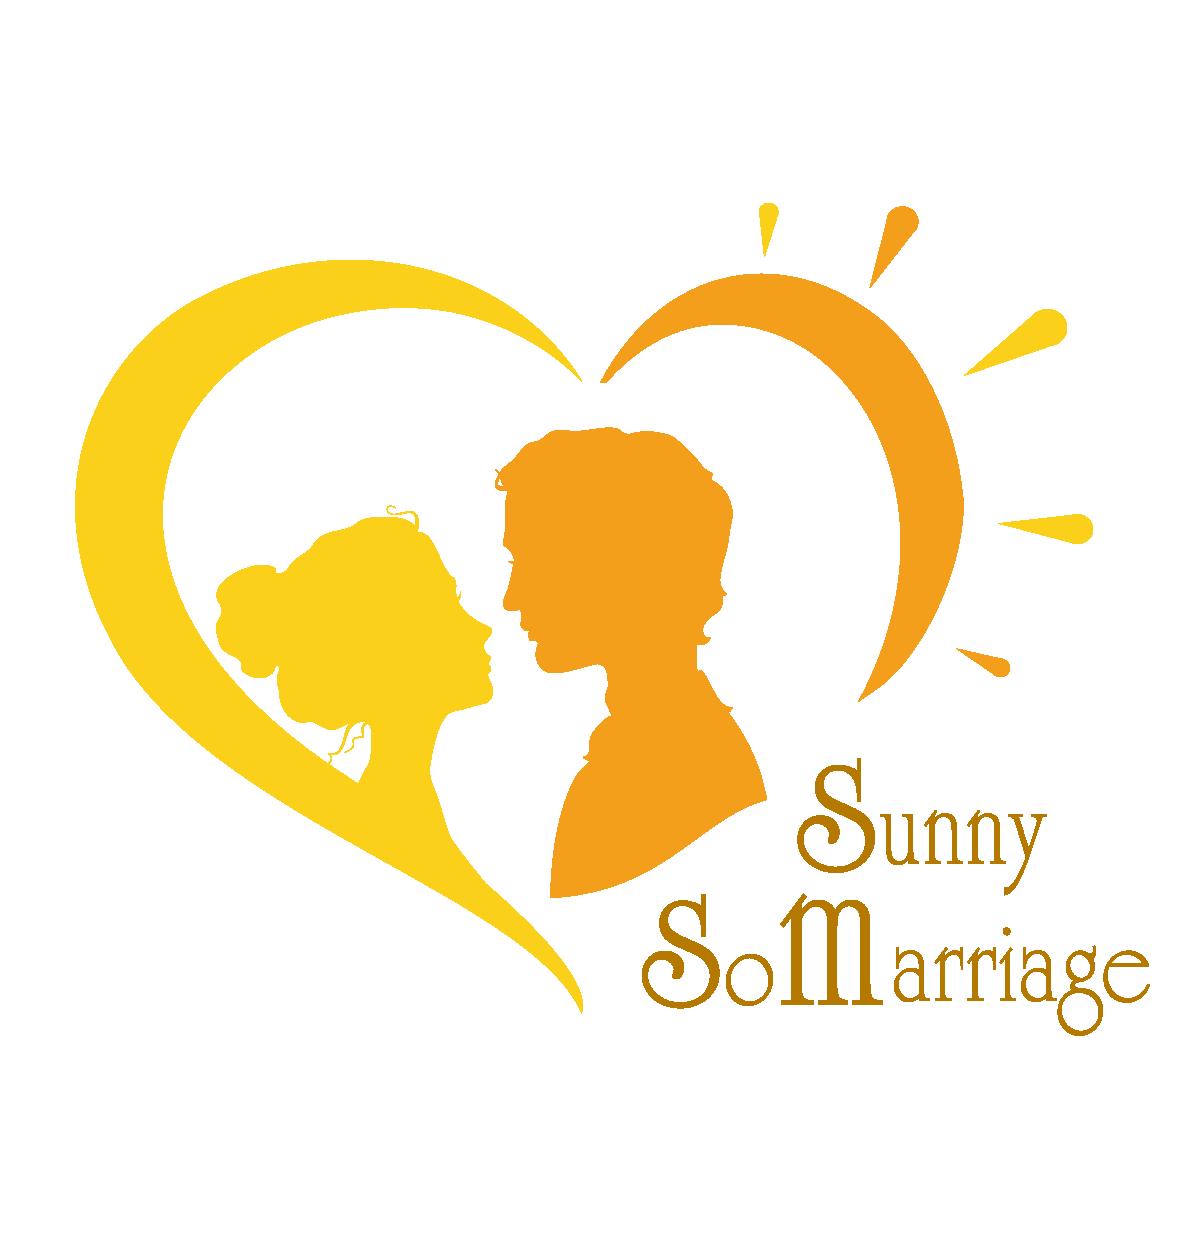 sunny so marriage サニーソウマリッジ